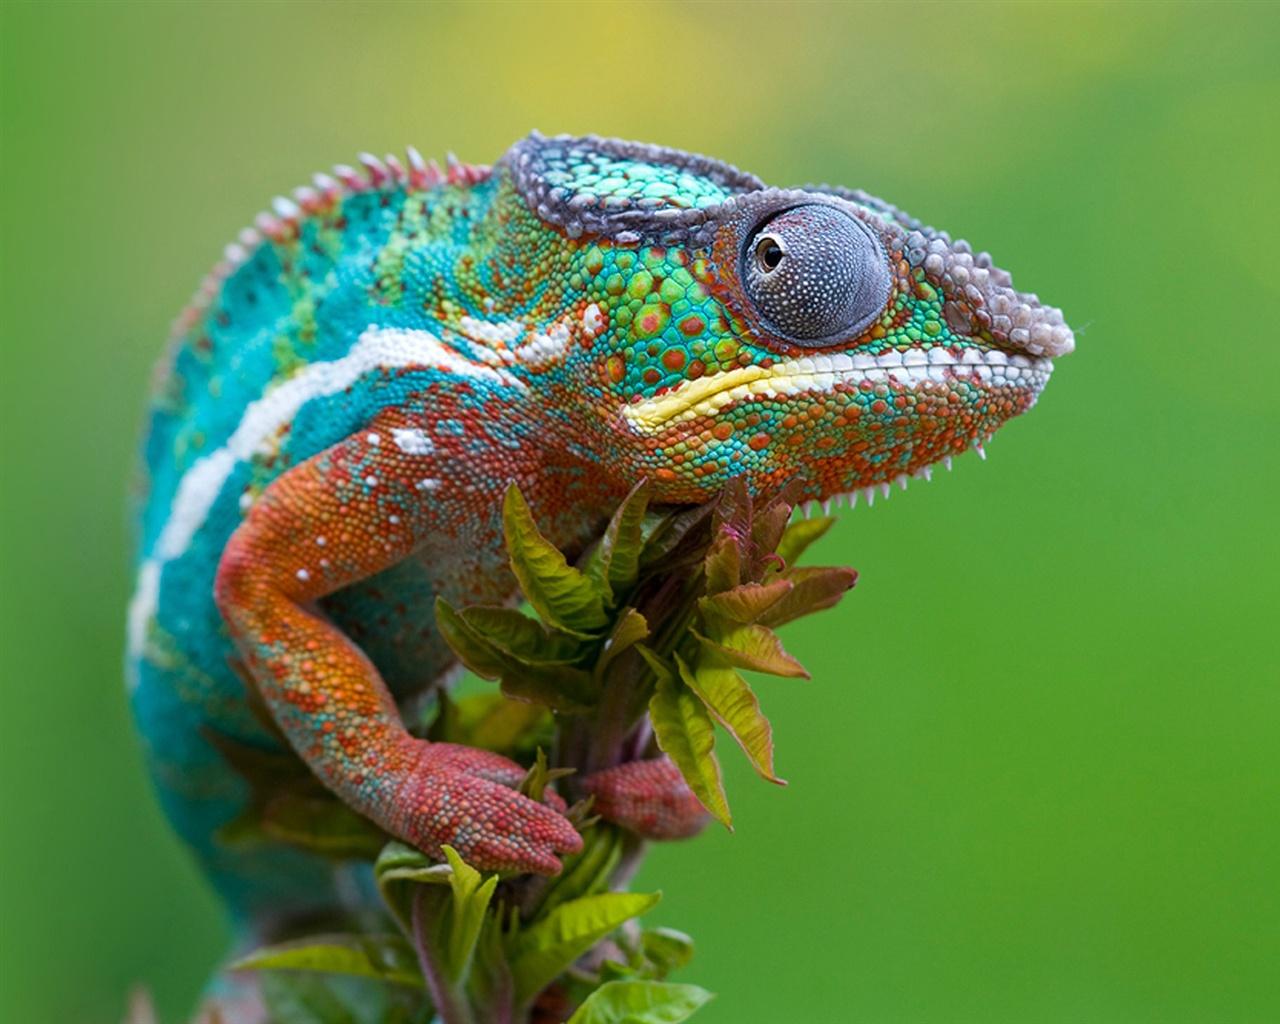 chameleon-gaze_1280x1024